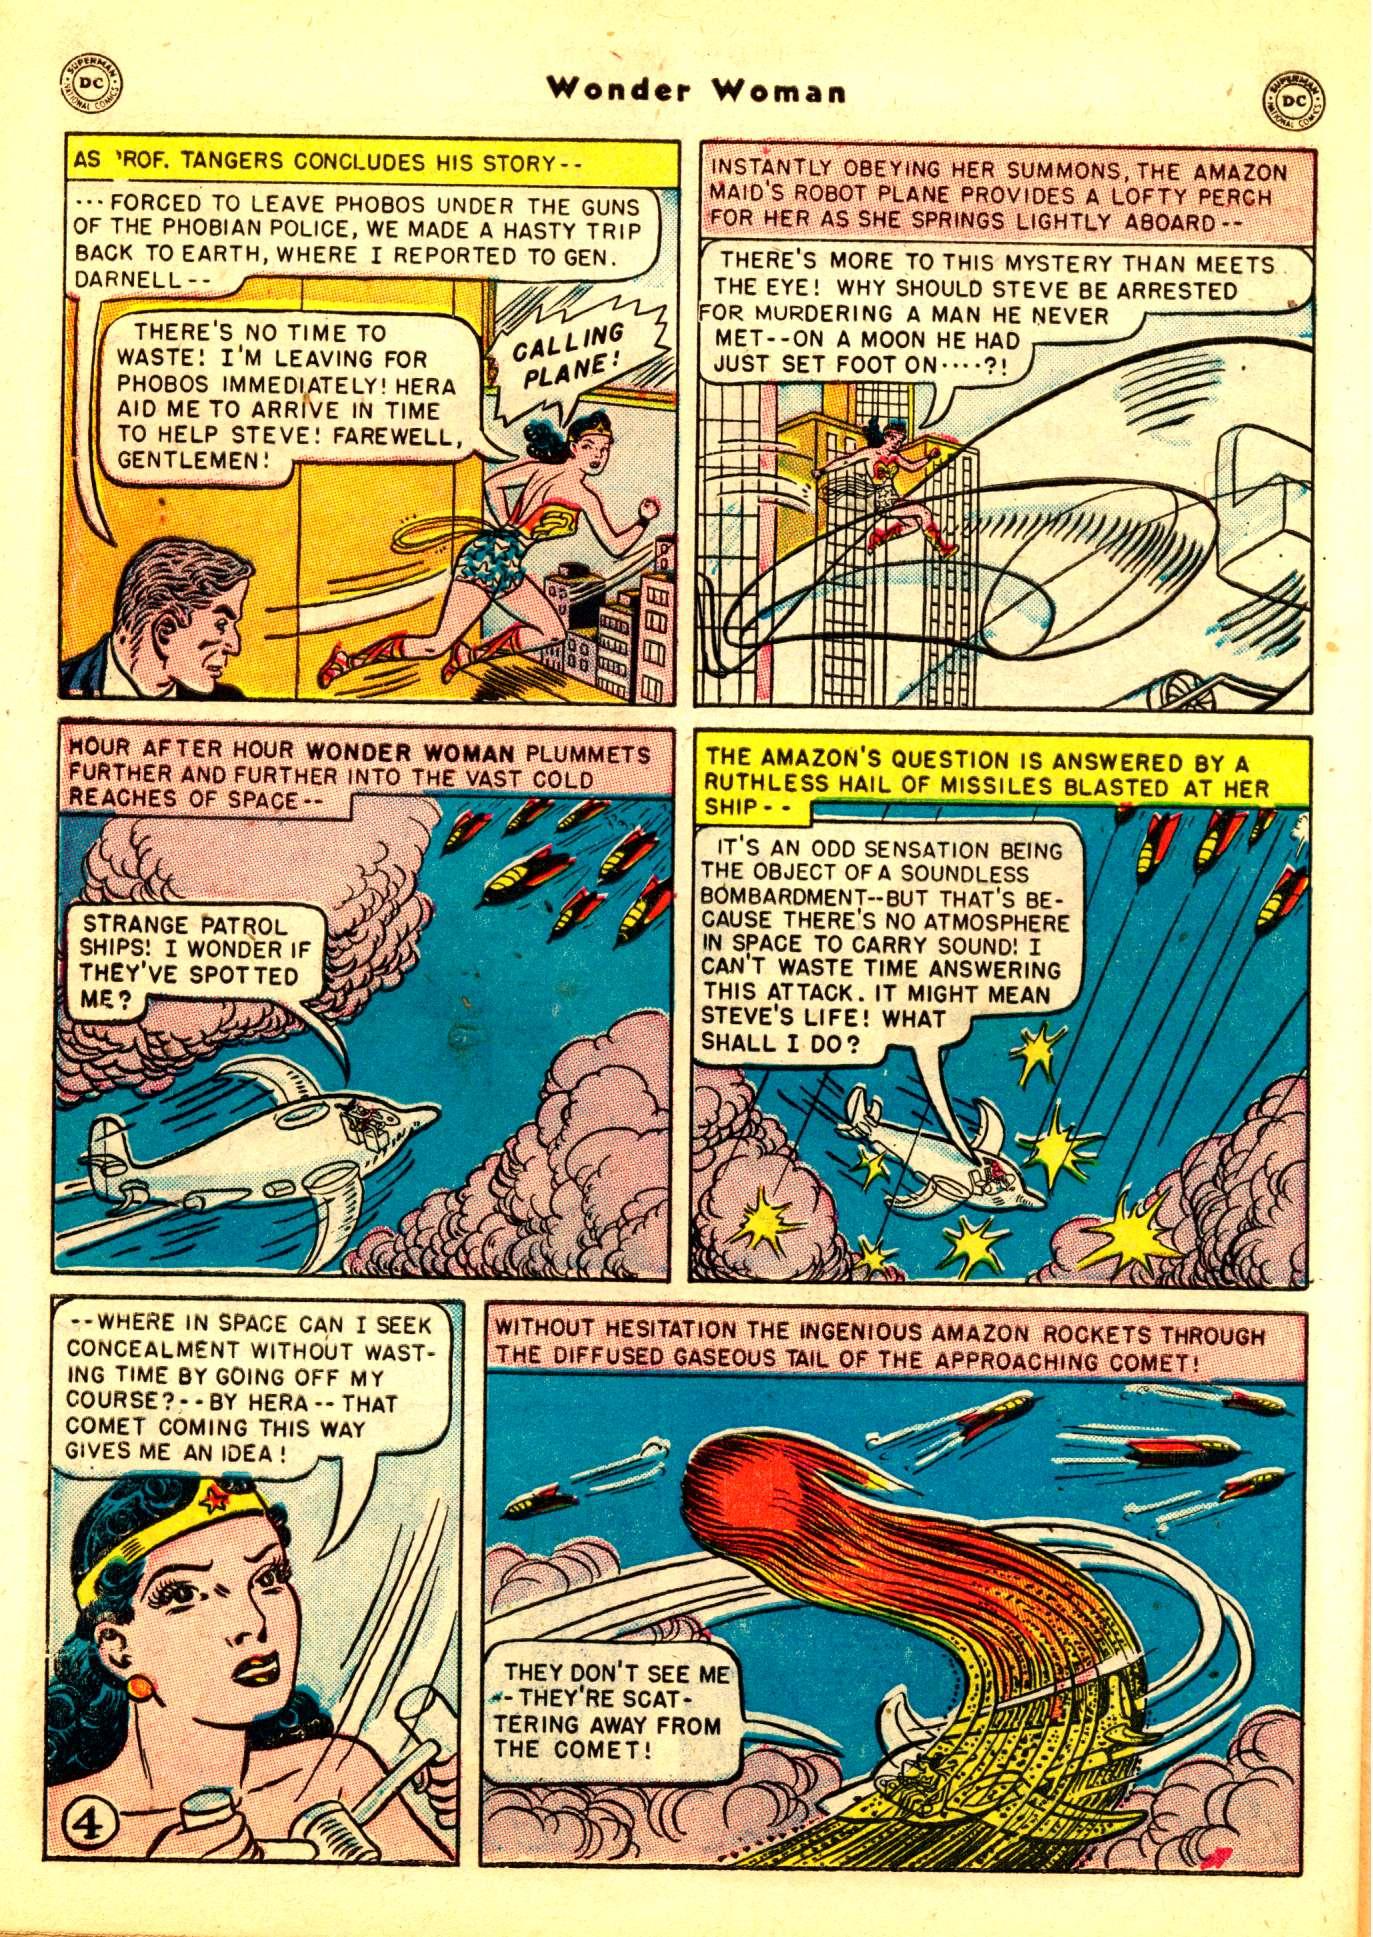 Wonder Woman Arrested